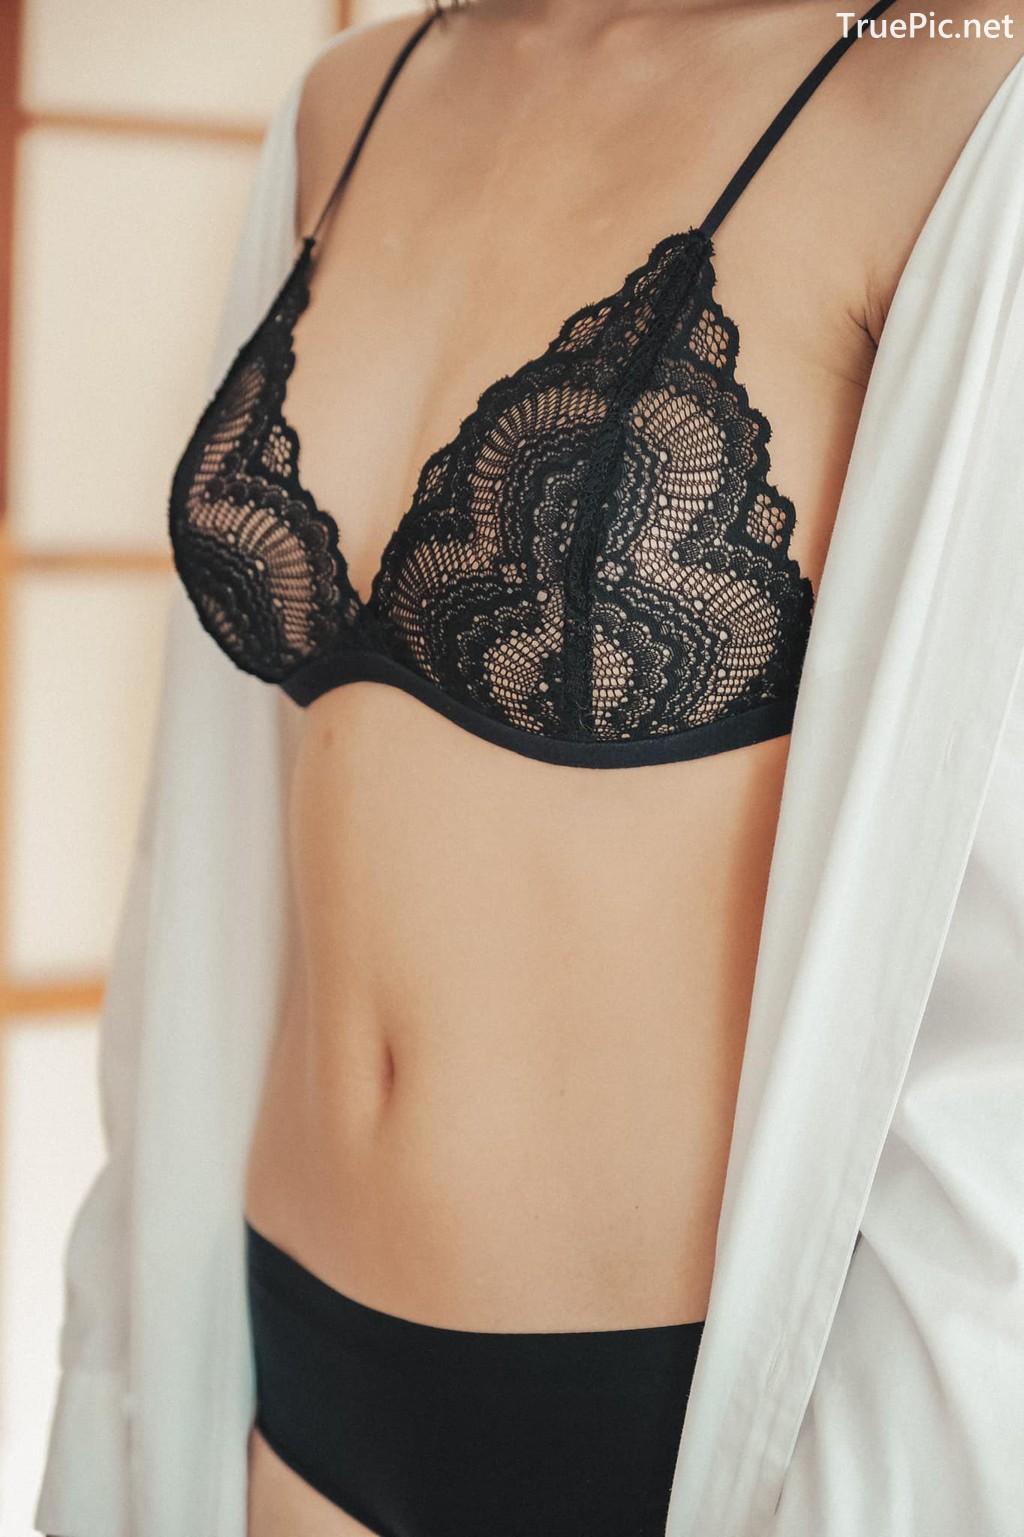 Image Thailand Sexy Model – Baifern Rinrucha Kamnark – Black Lingerie - TruePic.net - Picture-3